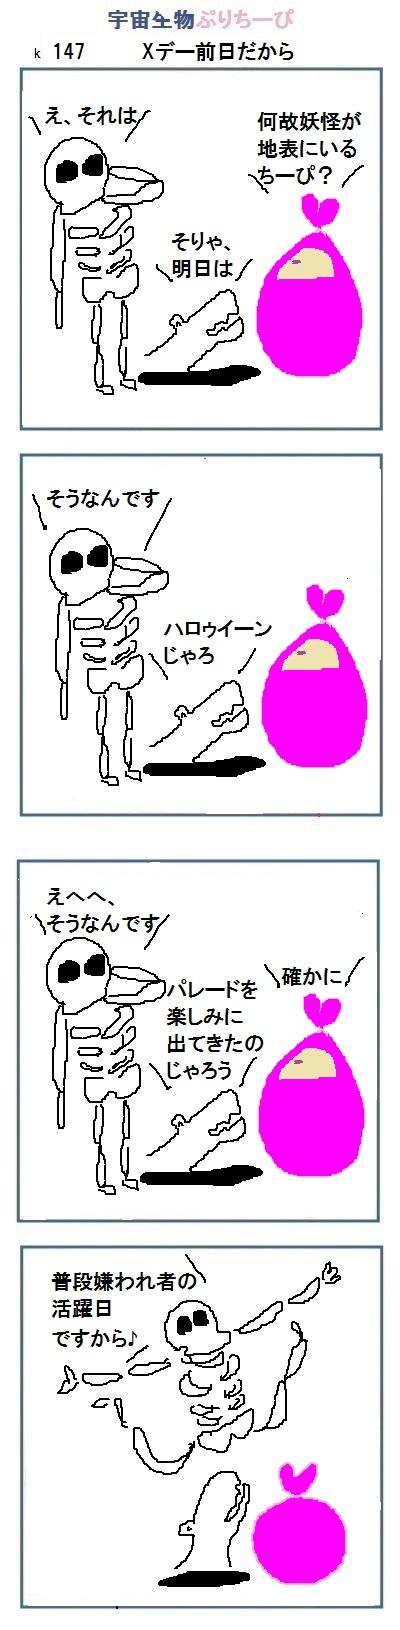 161030_k147